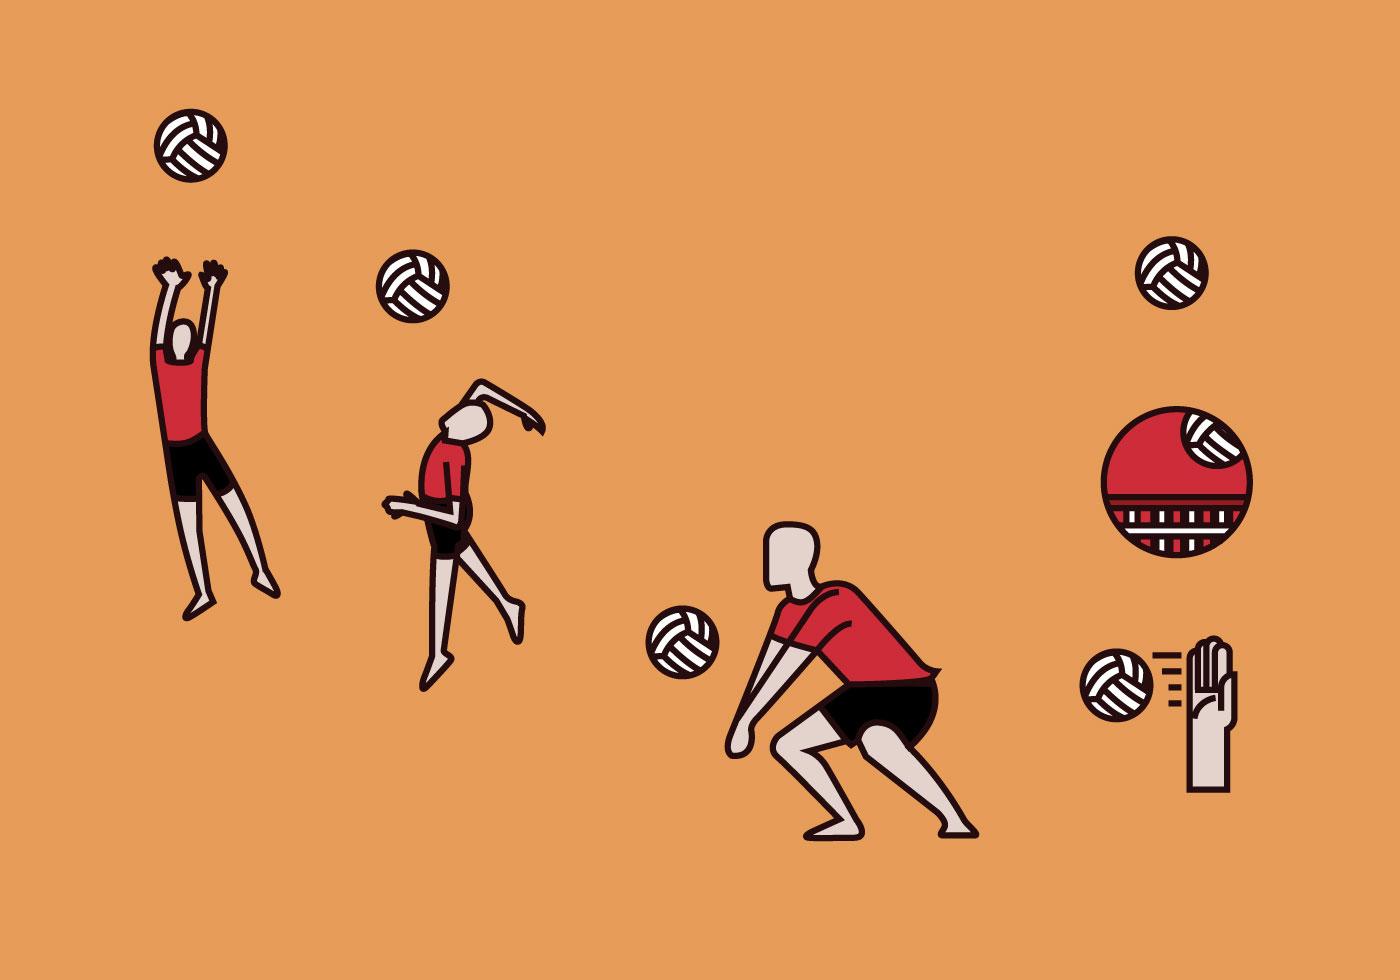 Volleyball Vector Illustrations Download Free Vector Art